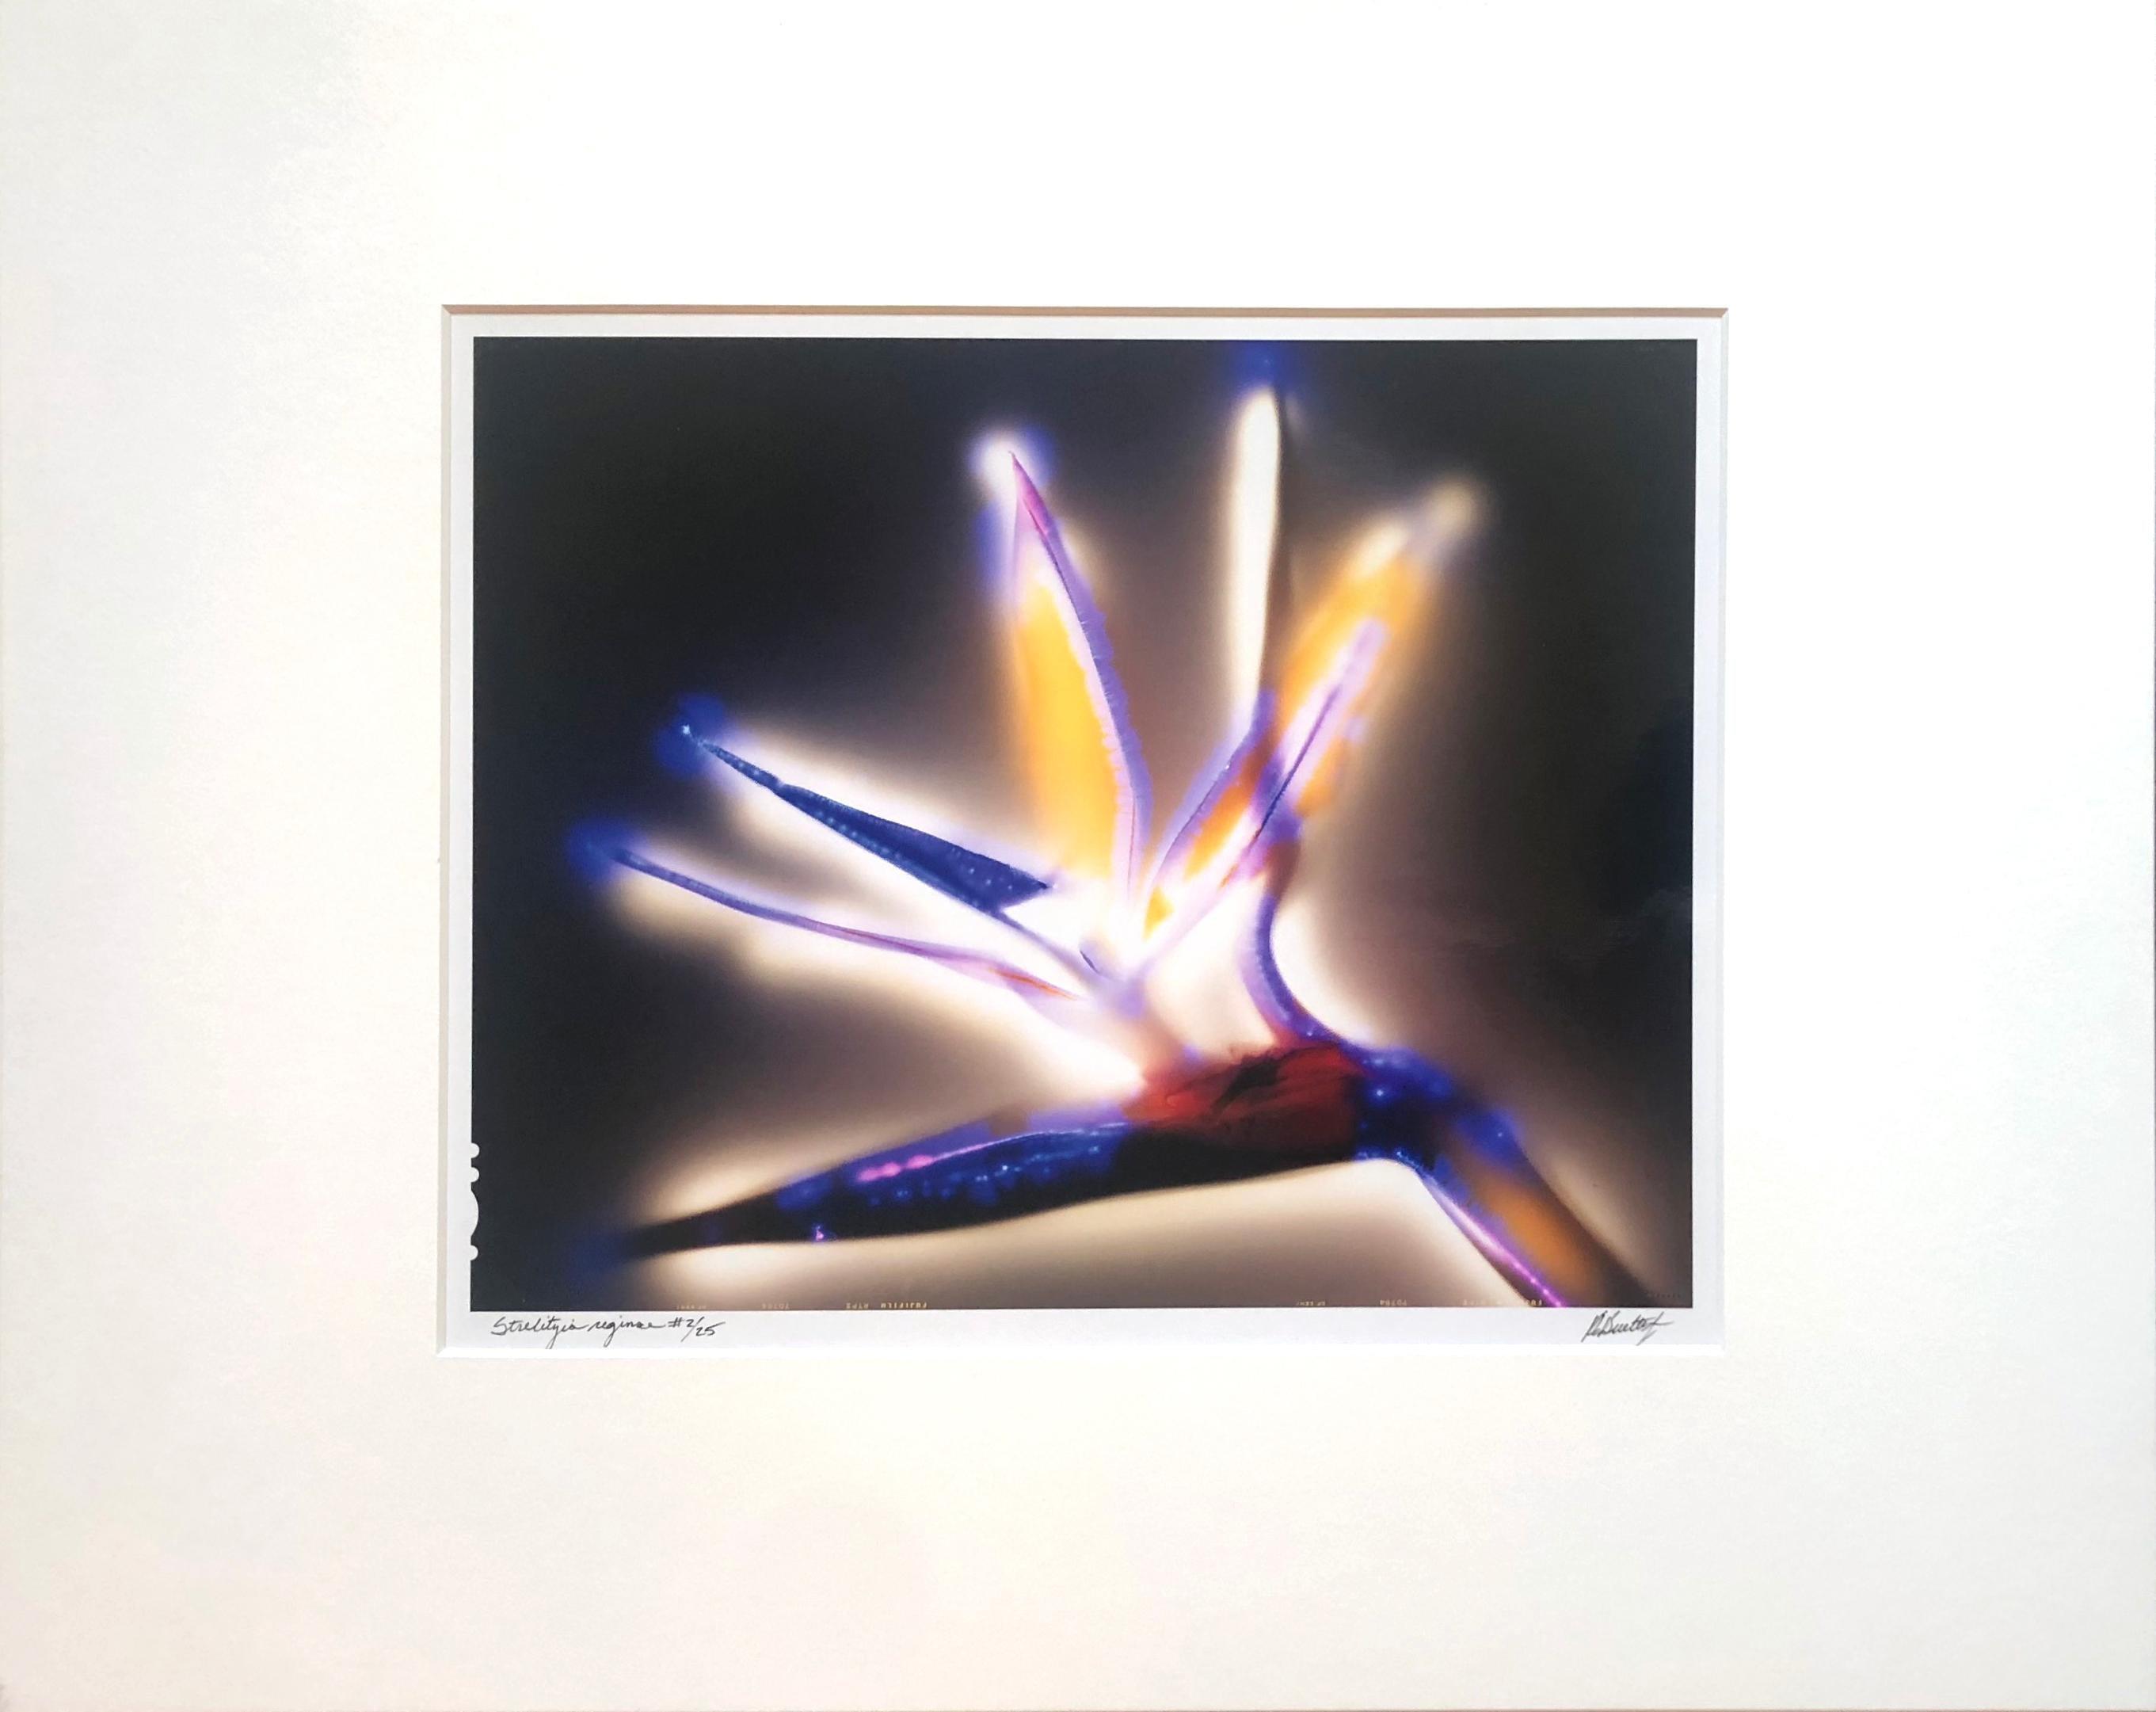 """Strelitzia reginae"" by Robert Buelteman, Cameraless photographic print, 2001"